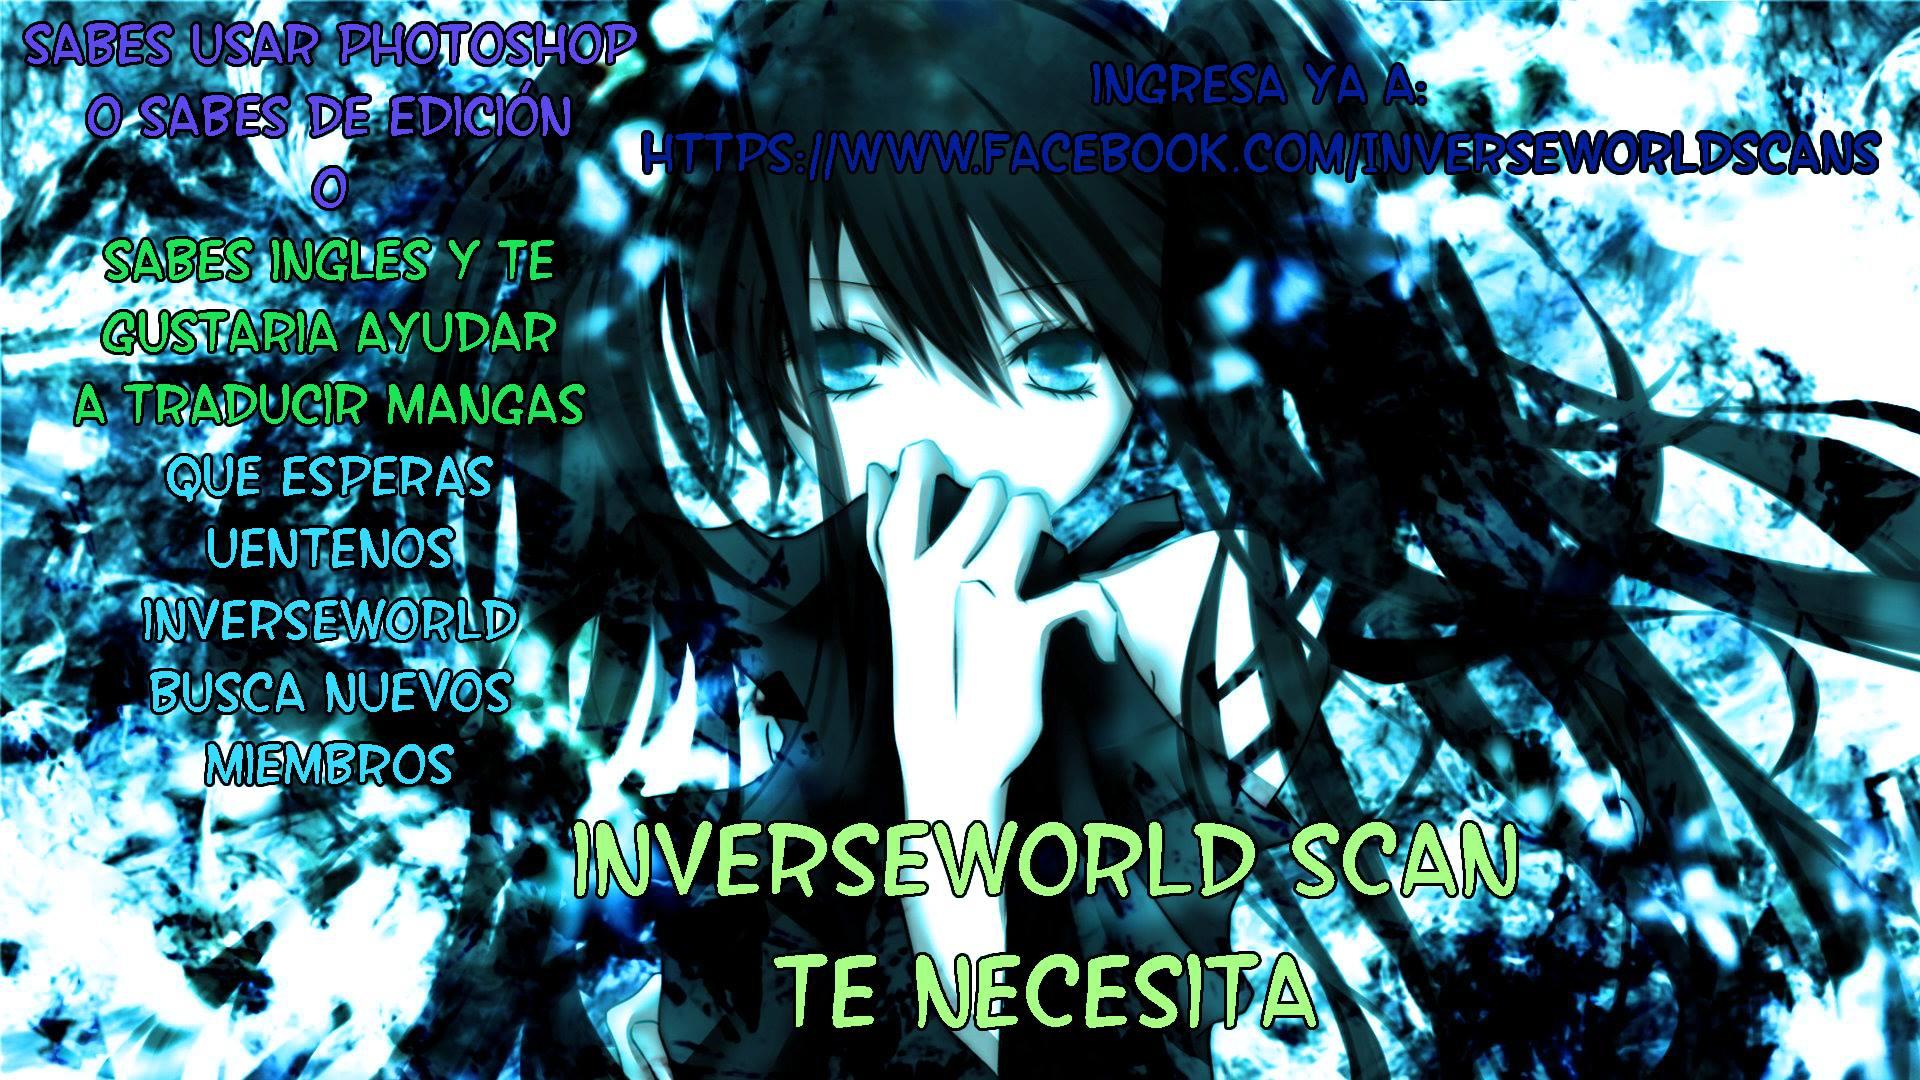 https://c5.ninemanga.com/es_manga/18/16210/415302/92664de43e5721bc5c0cfd1c31f08f30.jpg Page 1